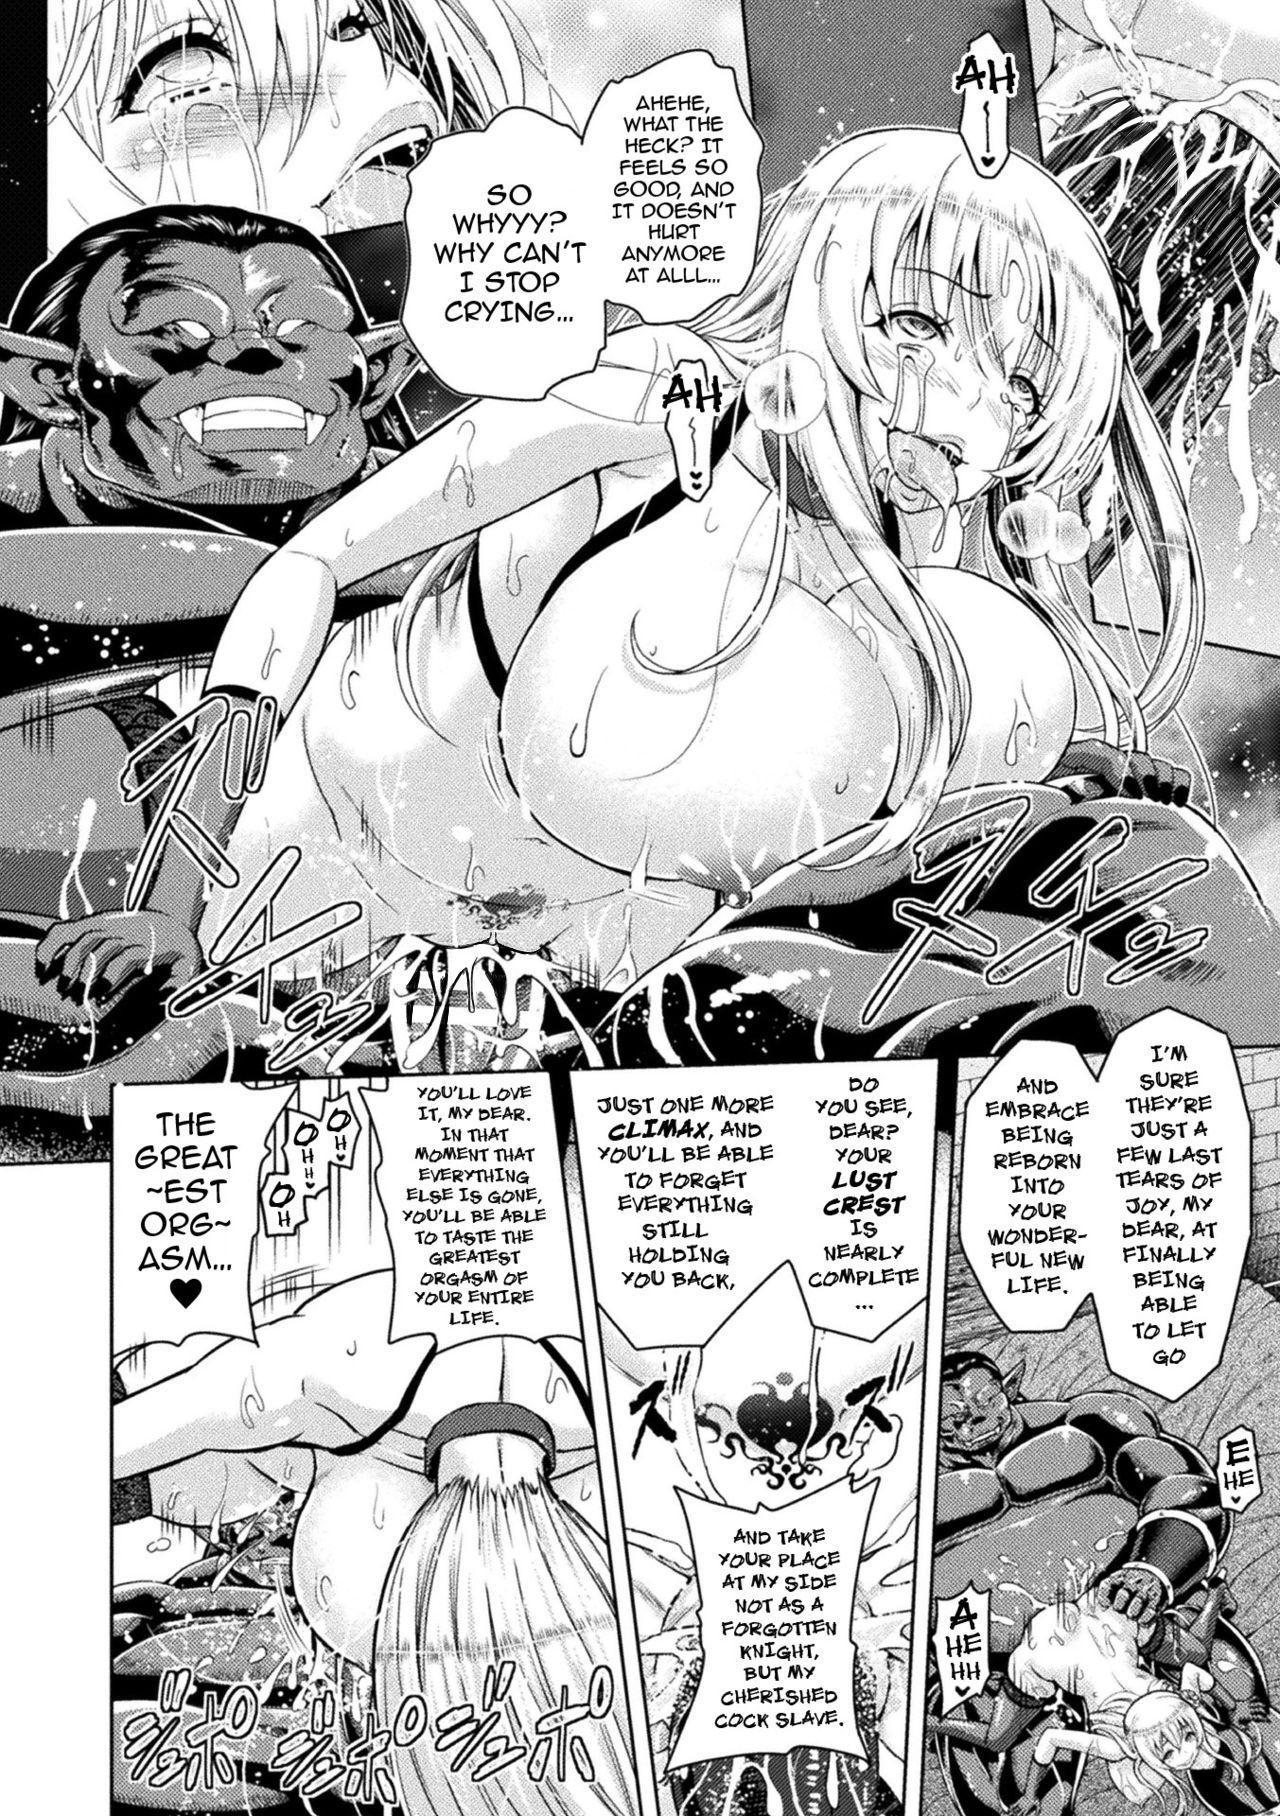 [Yamada Gogogo] Erona ~Orc no Inmon ni Okasareta Onna Kishi no Matsuro~ | Erona ~The Fall of a Beautiful Knight Cursed with the Lewd Mark of an Orc~ Ch. 1-6 [English] [darknight] [Decensored] [ongoing] 69